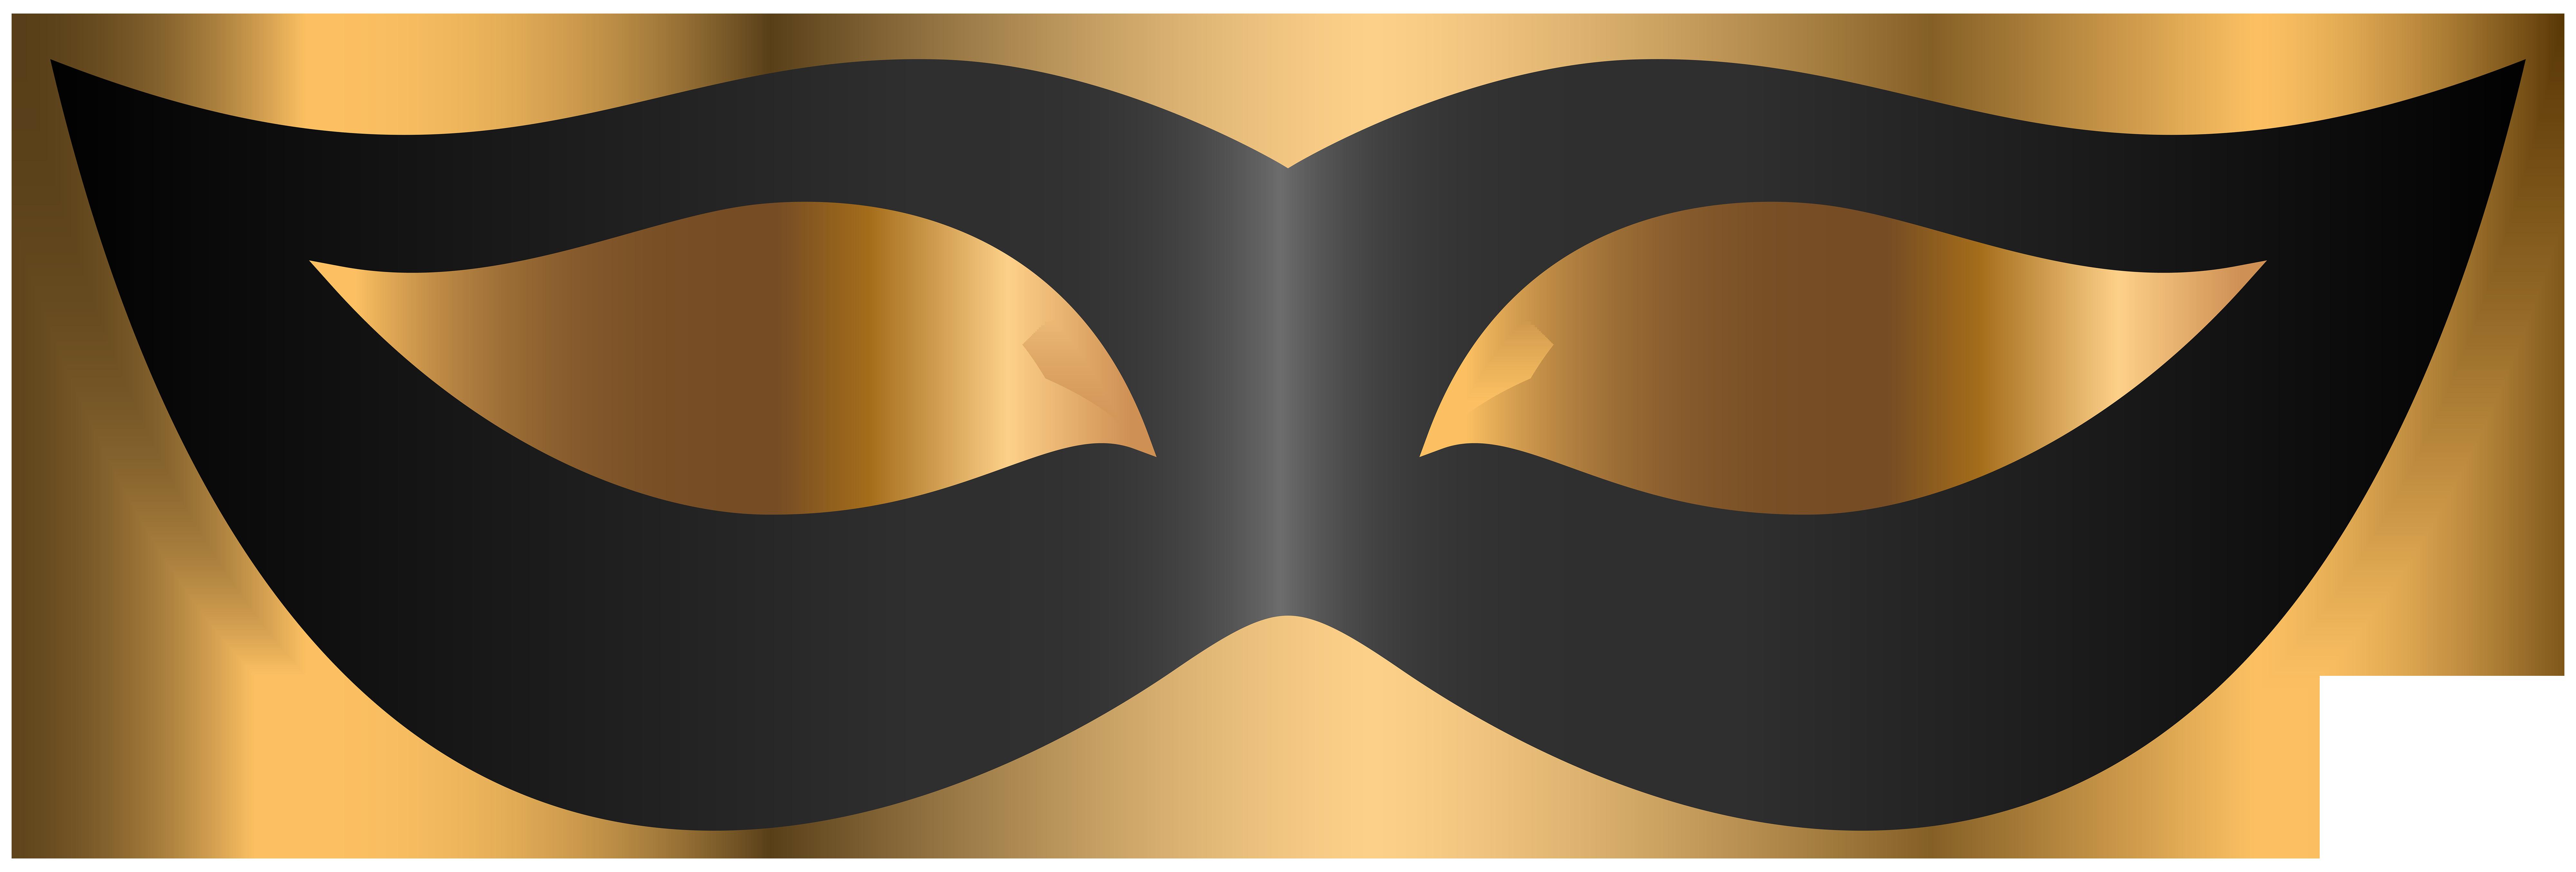 Carneval clipart carnival mask Art Mask Clip Transparent Gallery